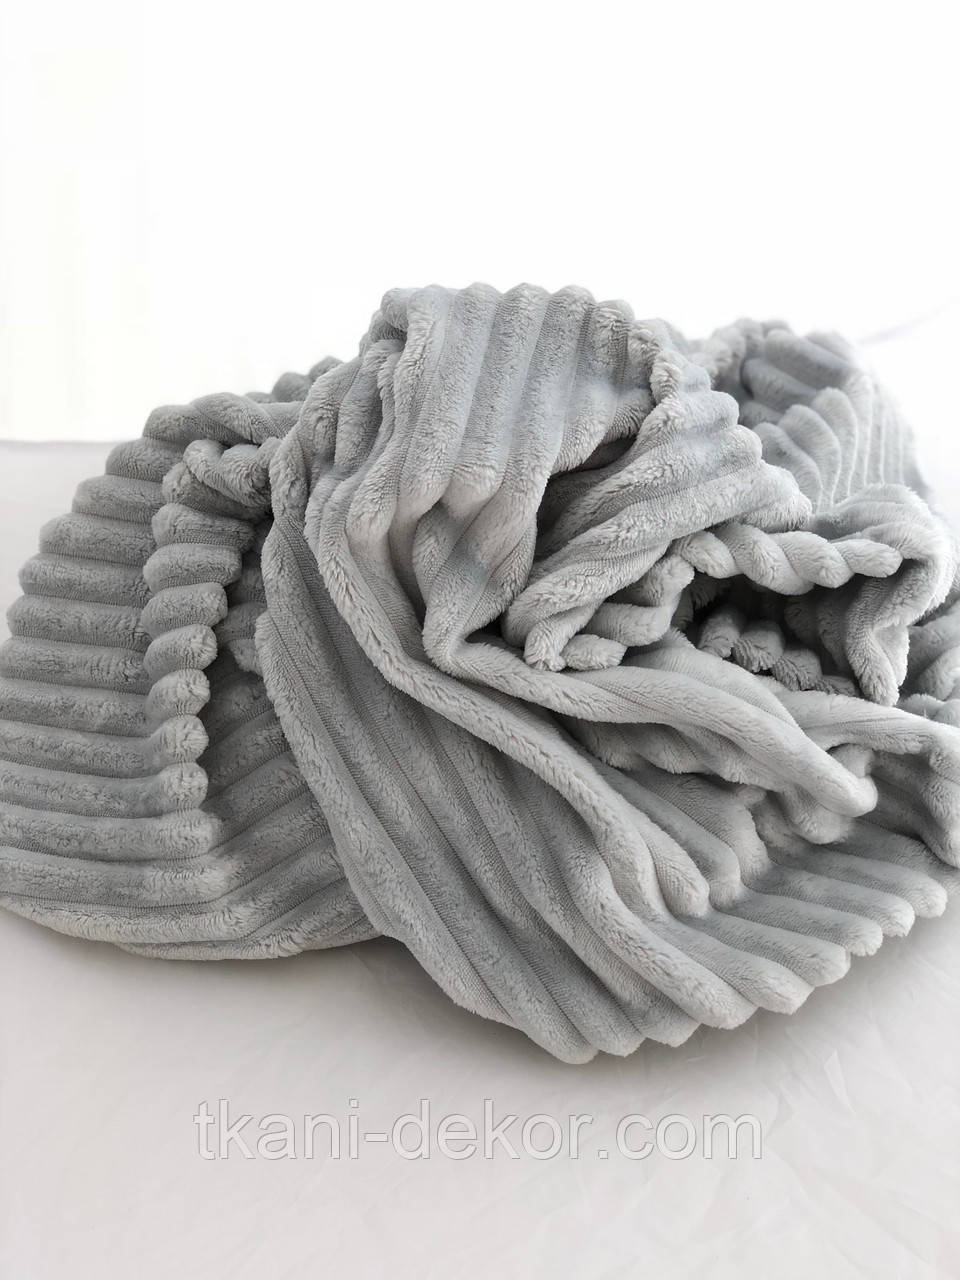 Плюшевая ткань Minky Stripes светло-серого цвета (шарпей)